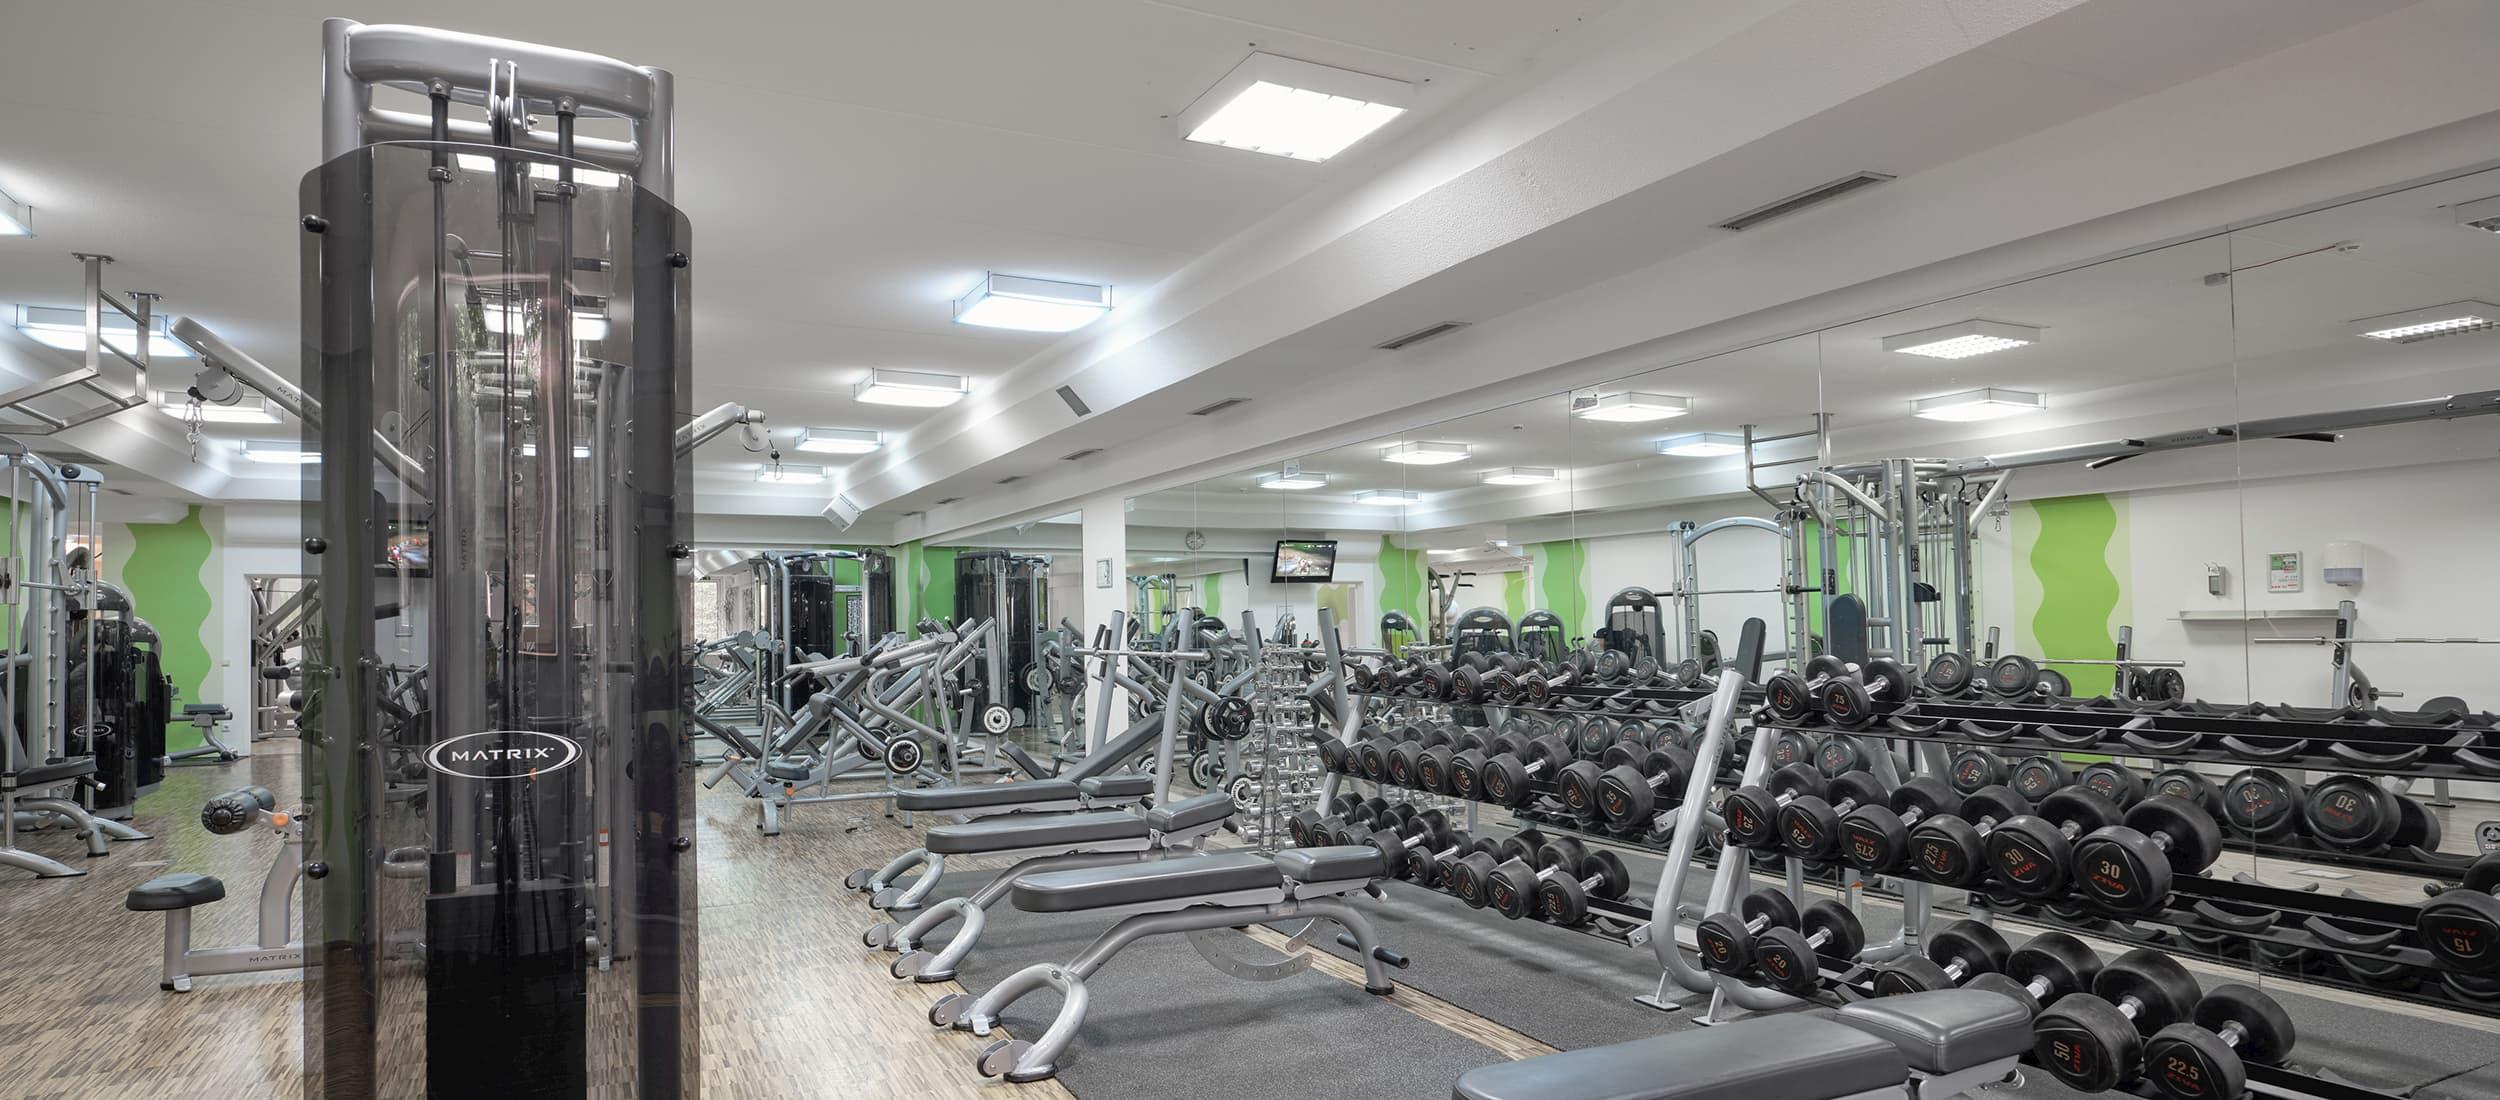 03_Kopfbild-fitness